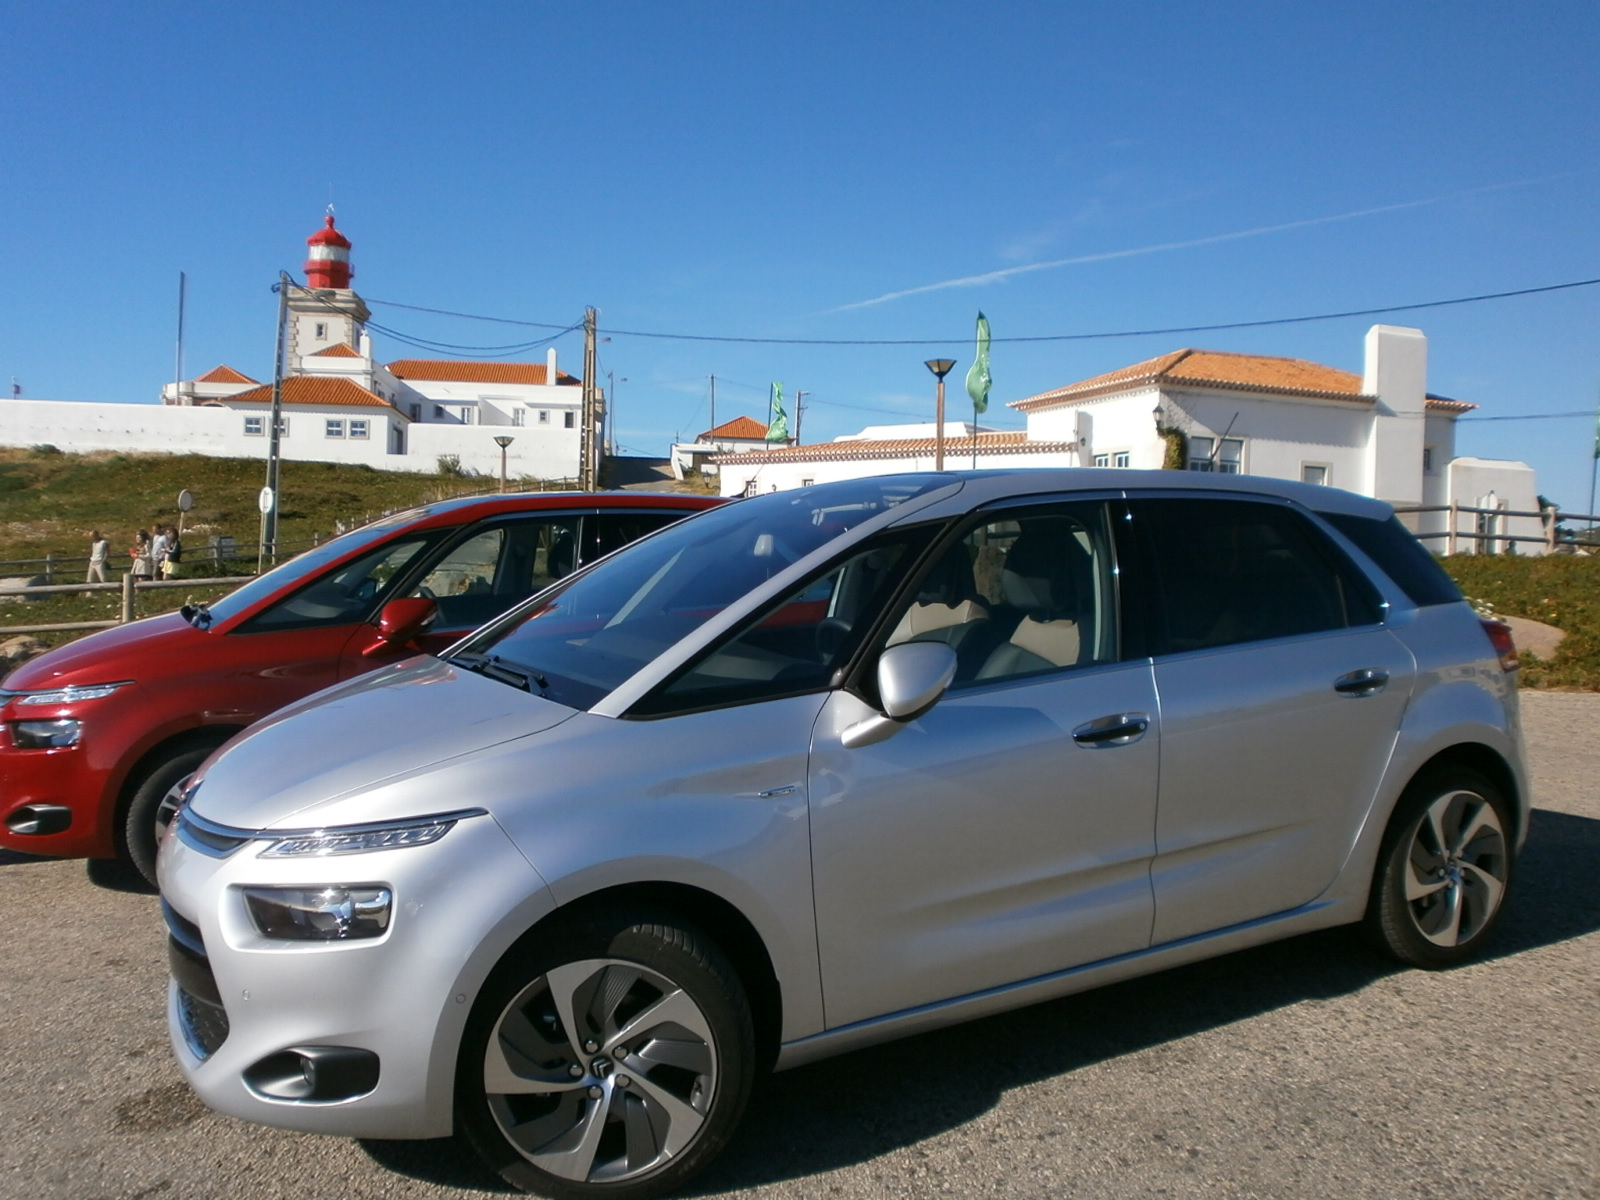 "Nuova Citroën C4 Picasso ""World Car Award"" 2014"